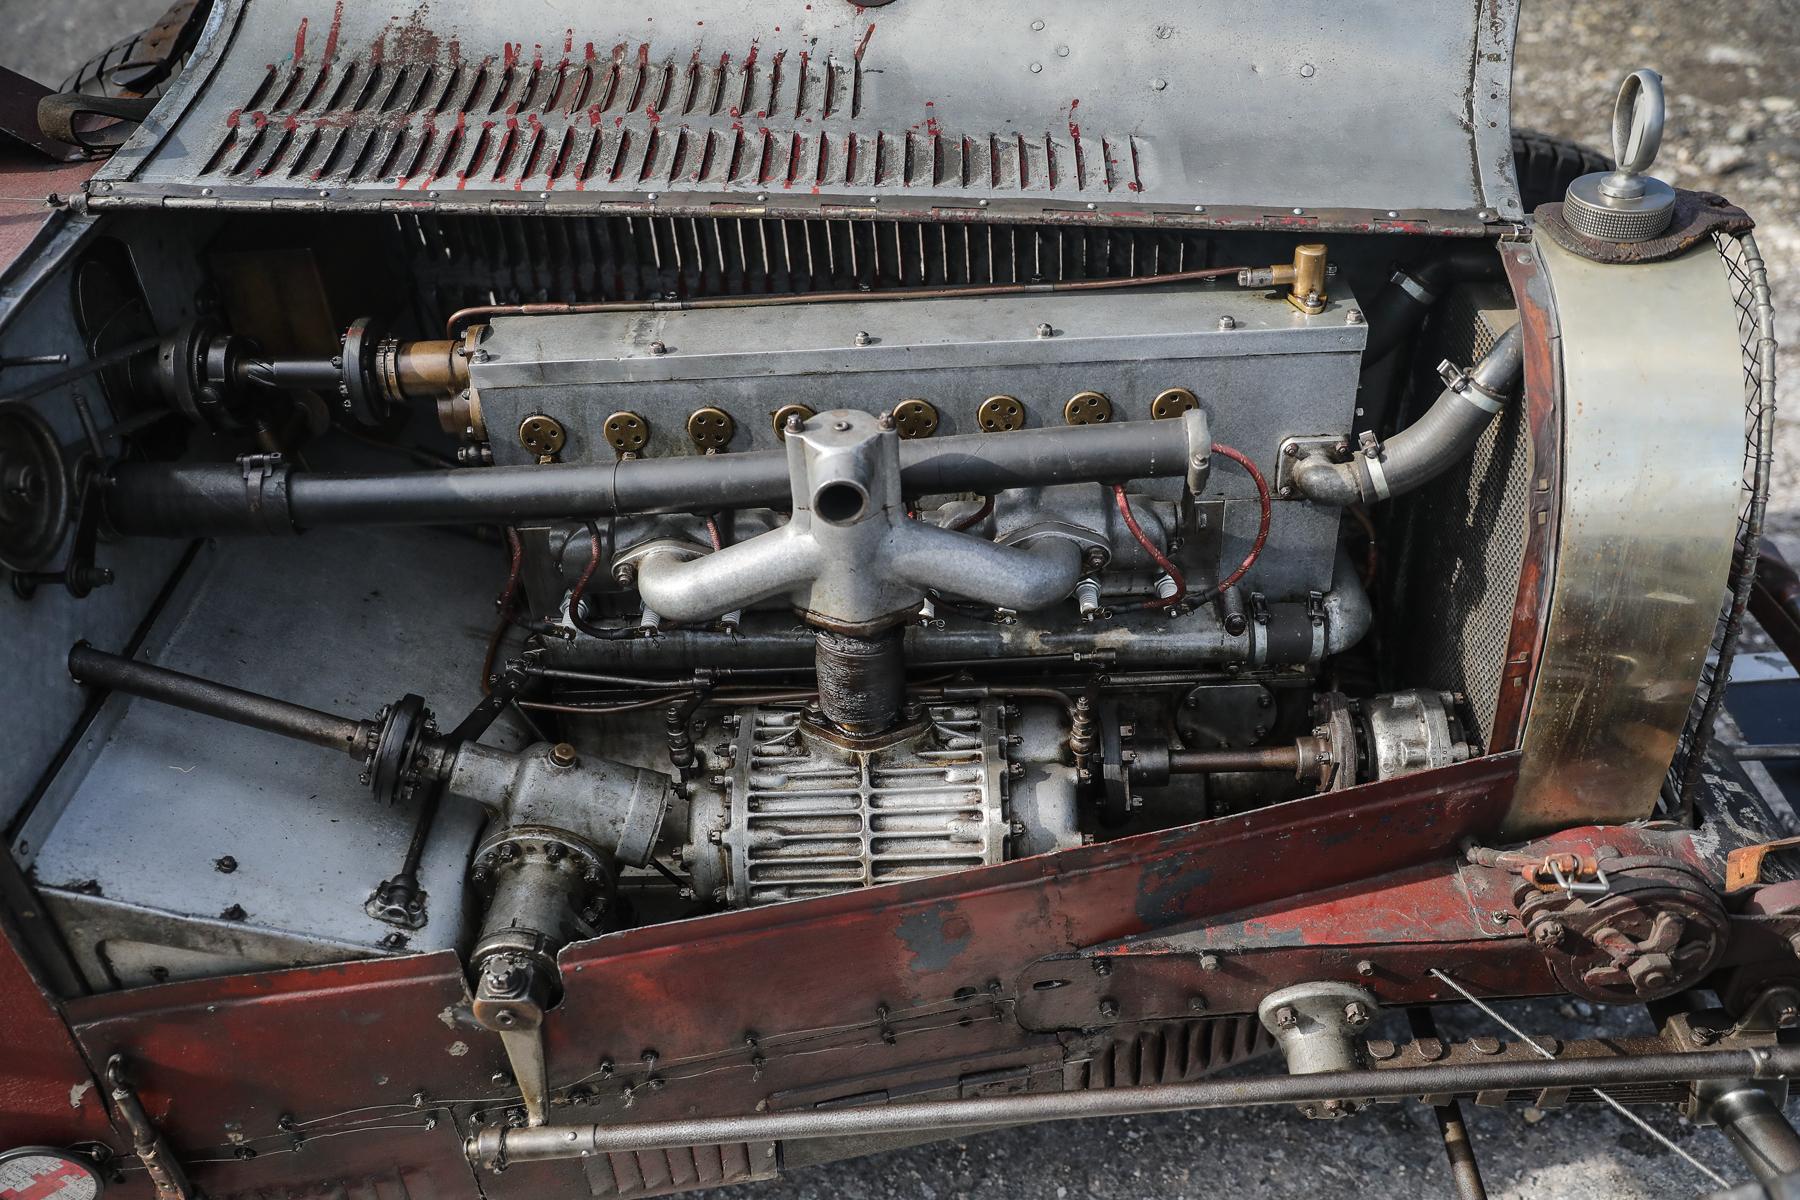 1928 Bugatti Type 35C Grand Prix engine